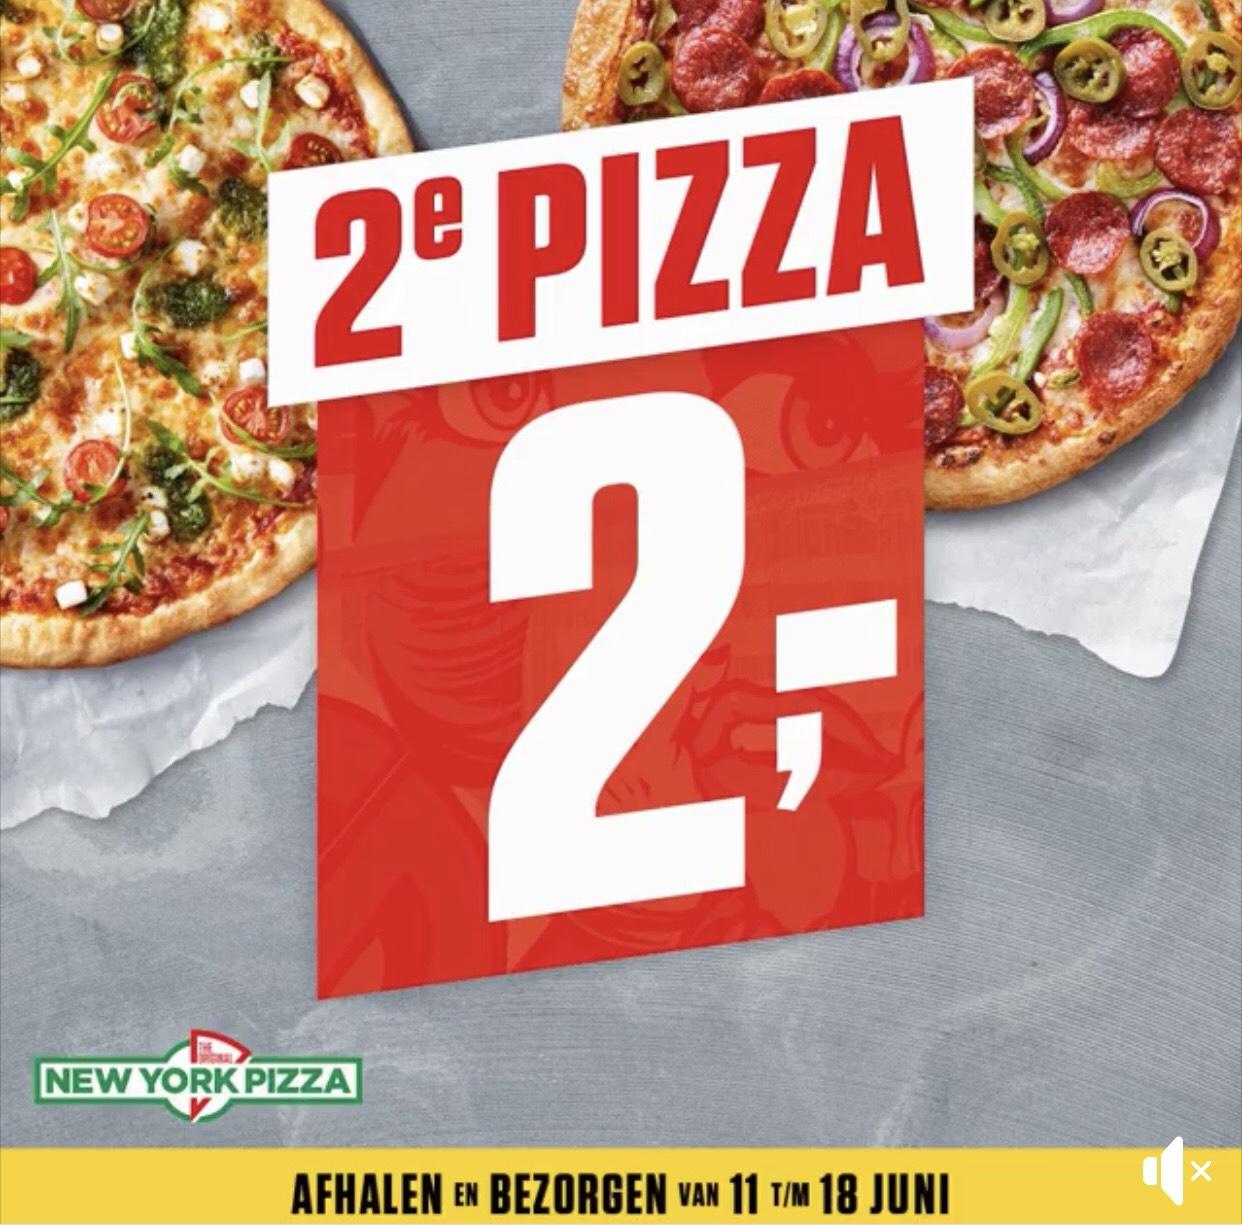 2e Pizza €2,- Bij bezorgen & Afhalen @ New York Pizza